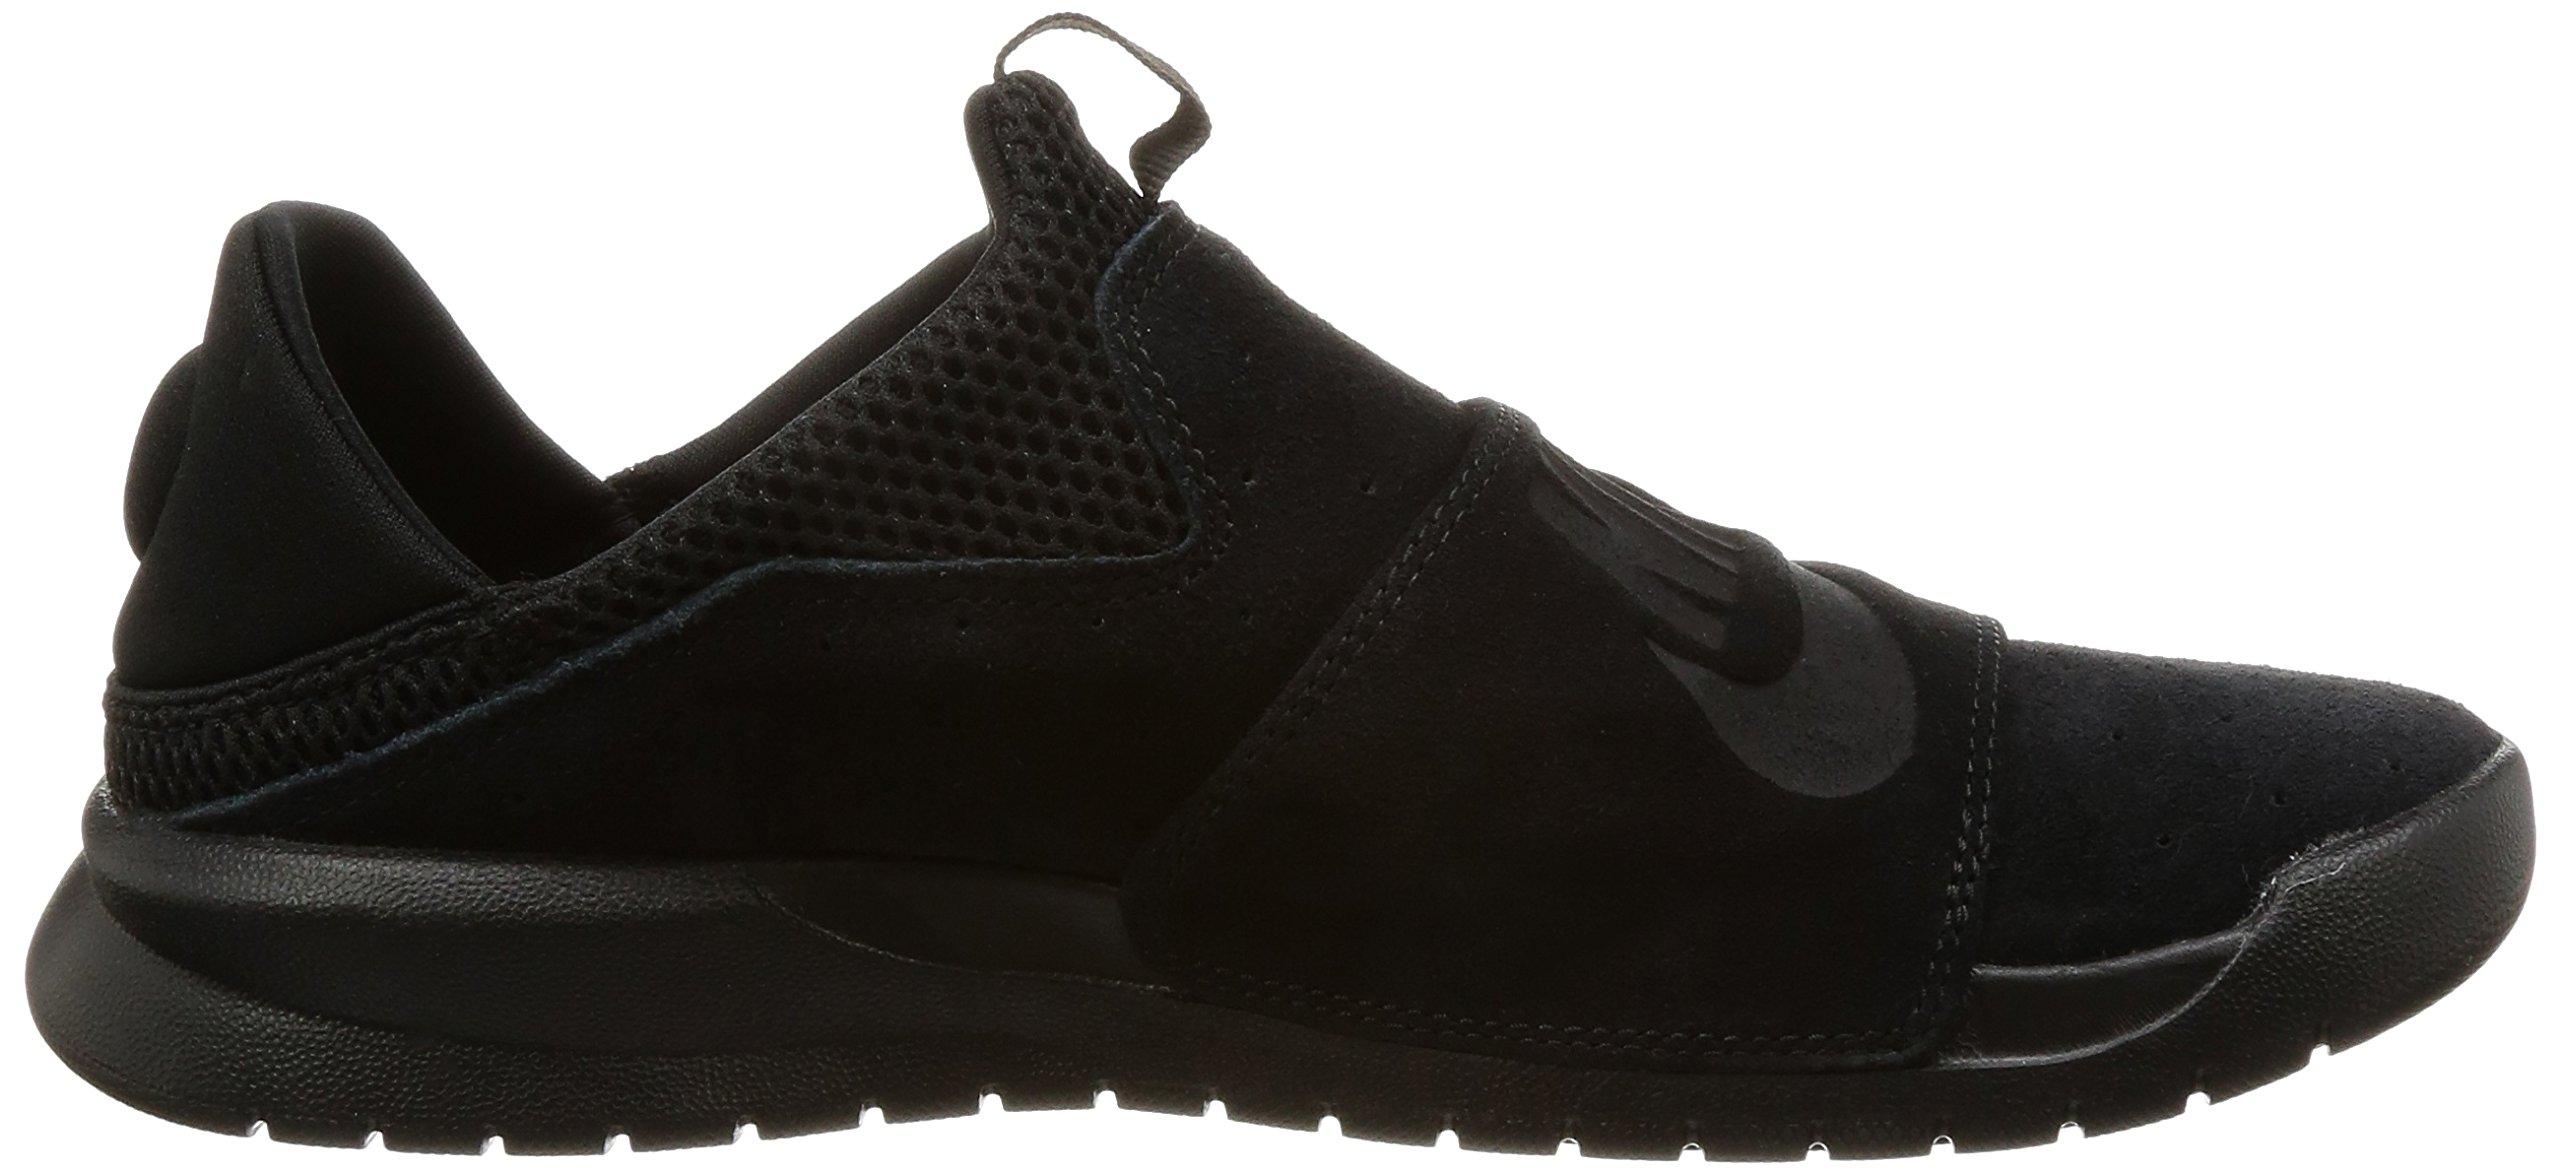 Nike BENASSI SLP Mens fashion-sneakers 882410-003_9.5 - BLACK/BLACK-BLACK by NIKE (Image #6)